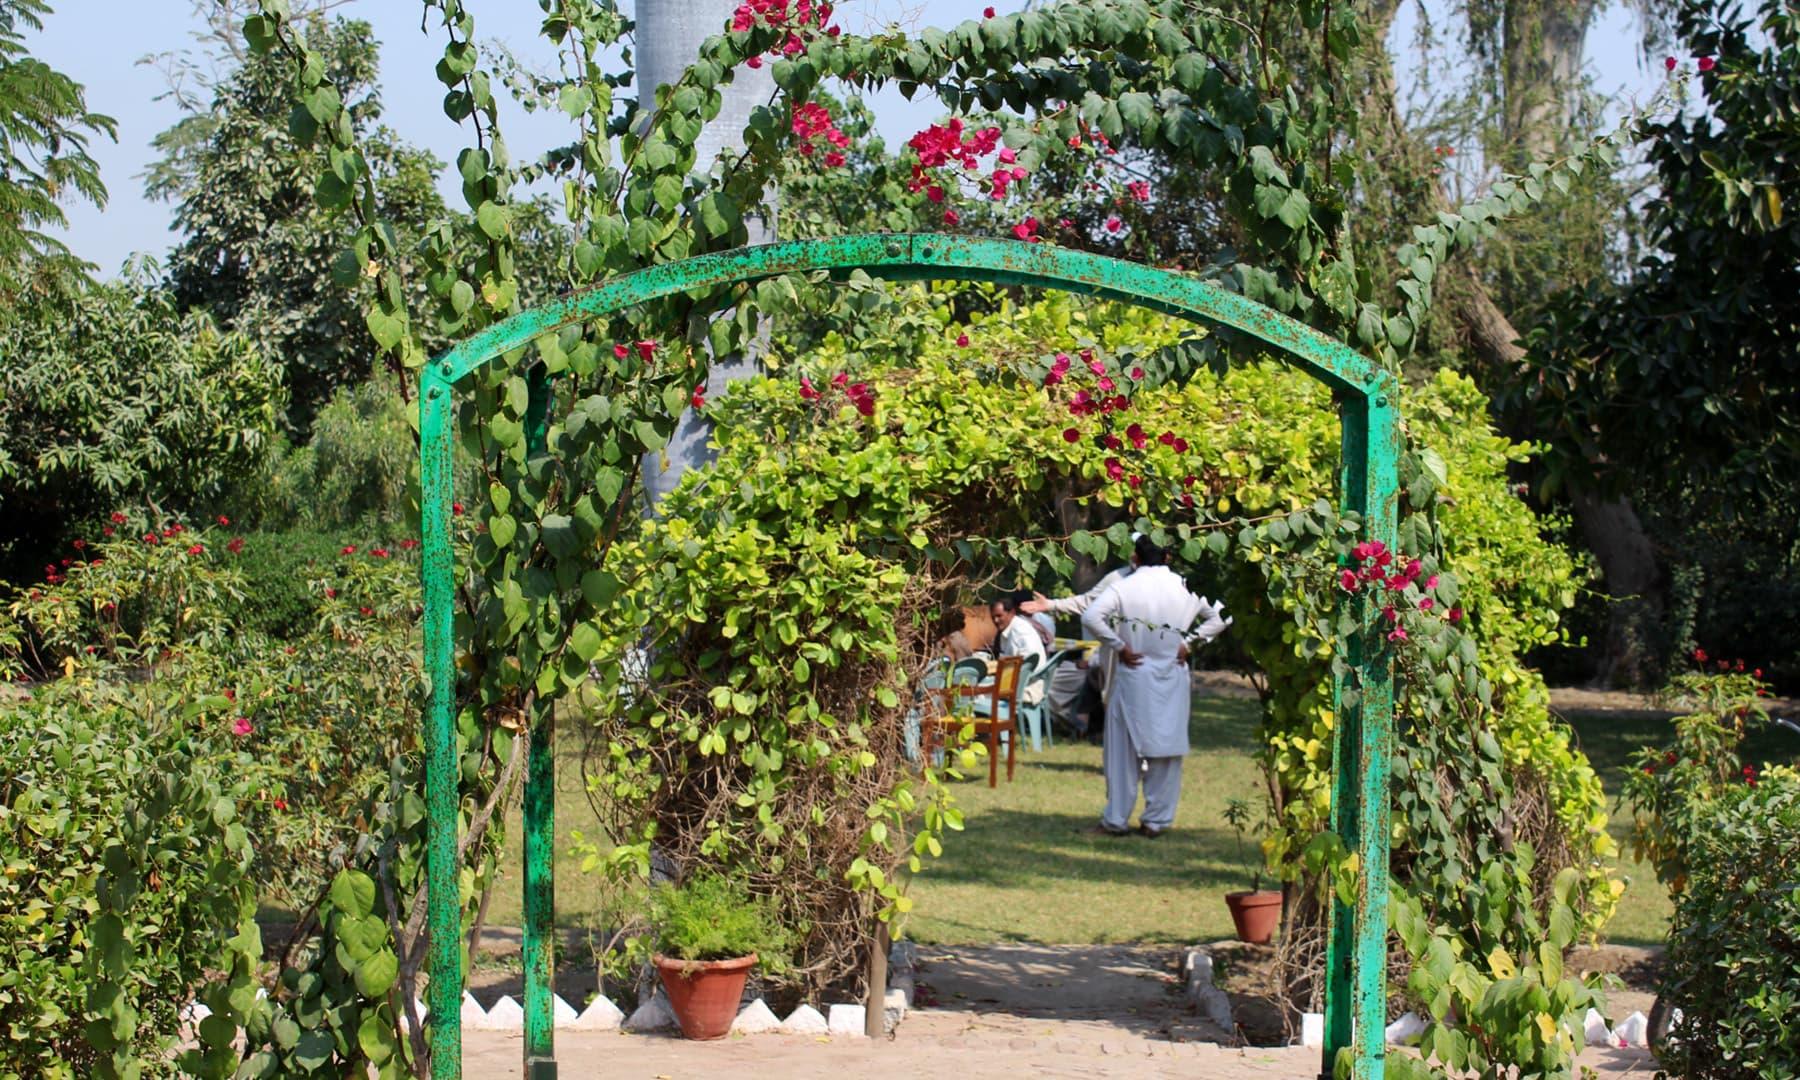 باغ کا داخلی دروازہ— فوٹو اختر حفیظ